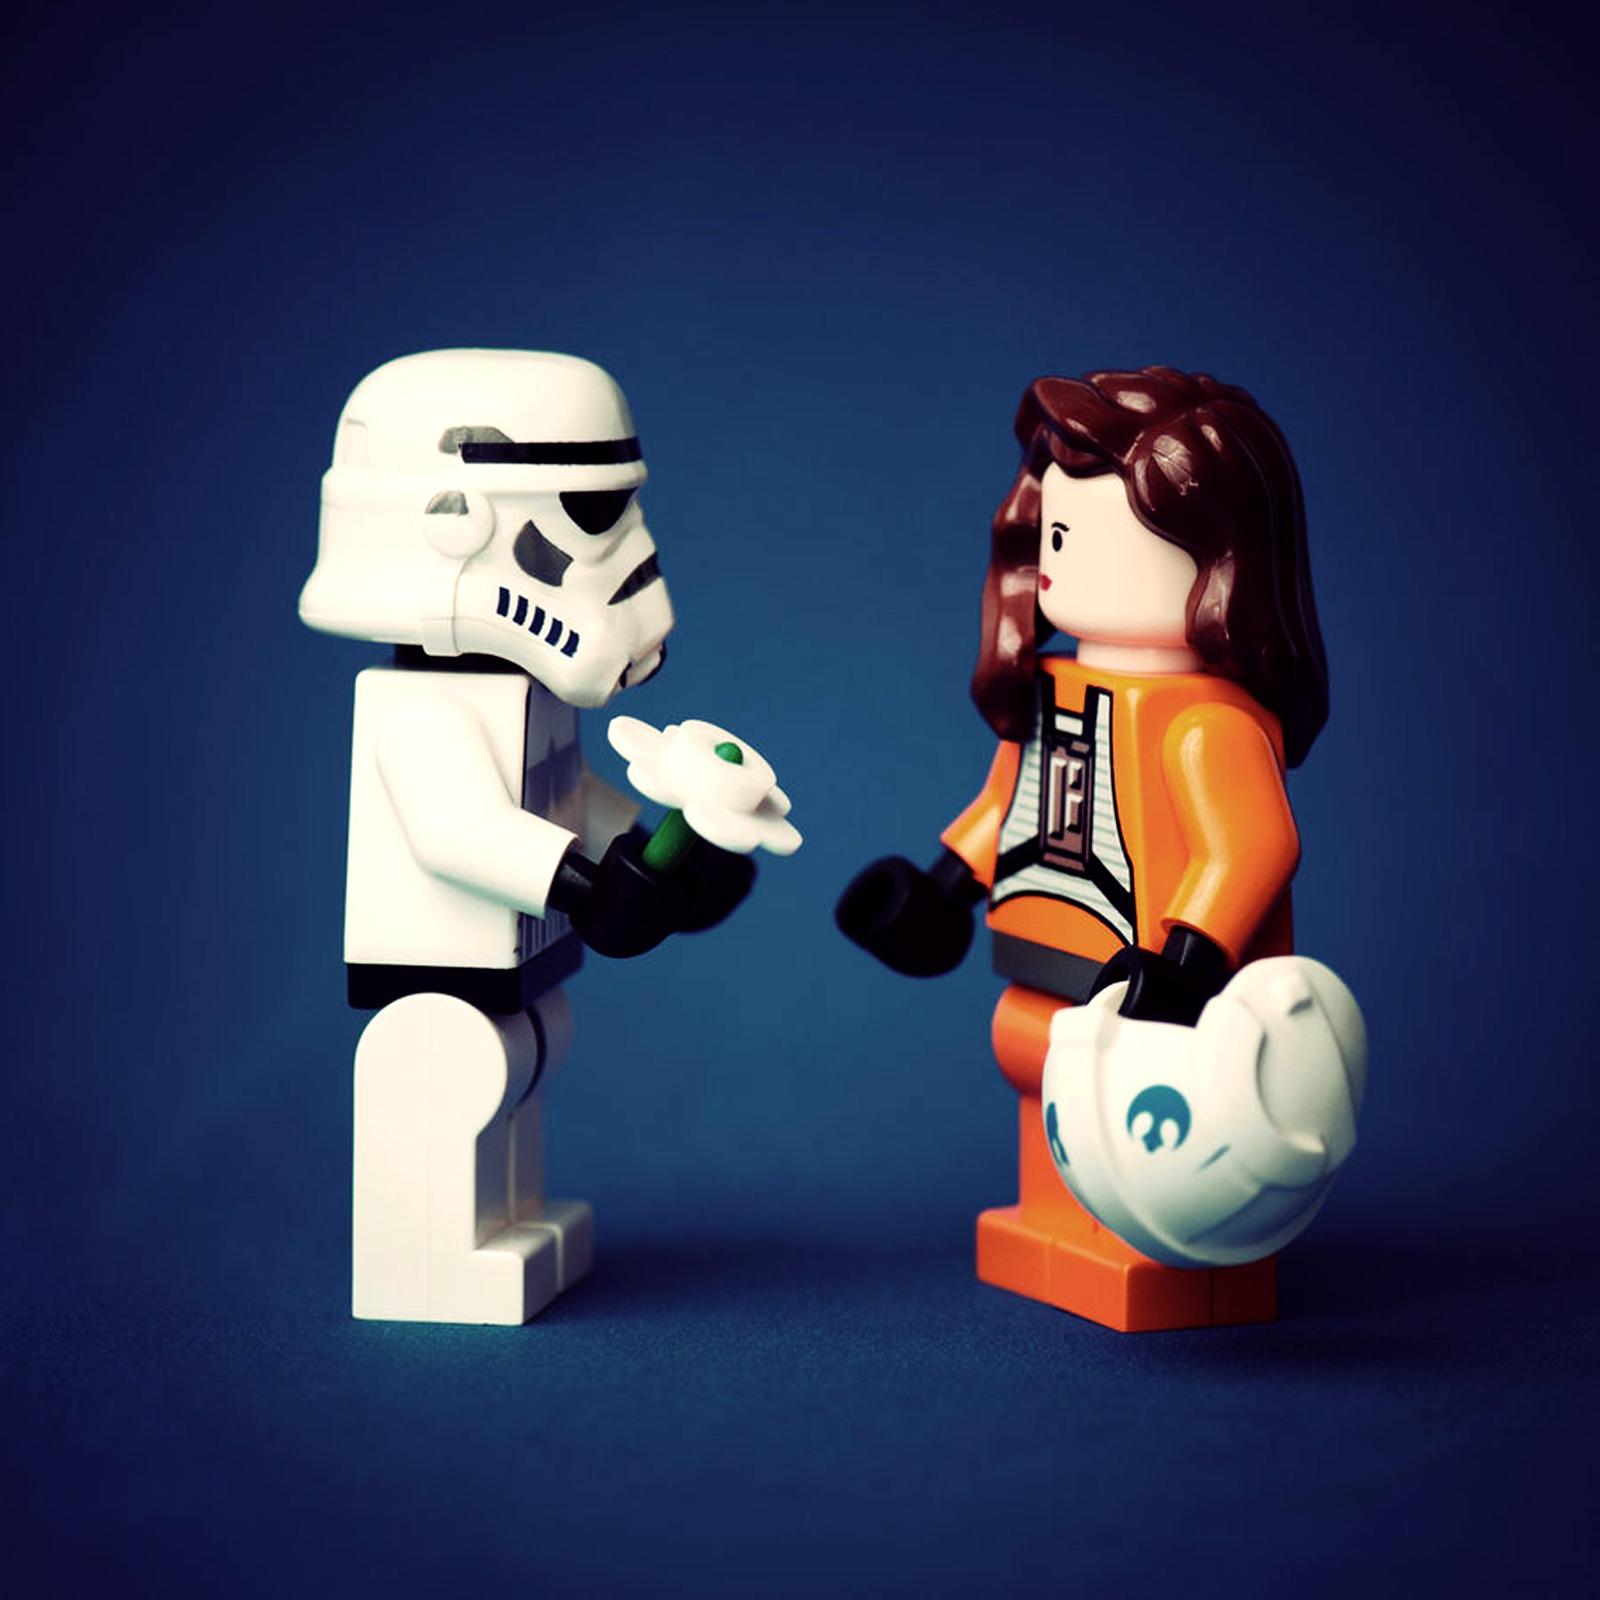 82 824079 cute stormtrooper lego wallpaper cute lego star wars